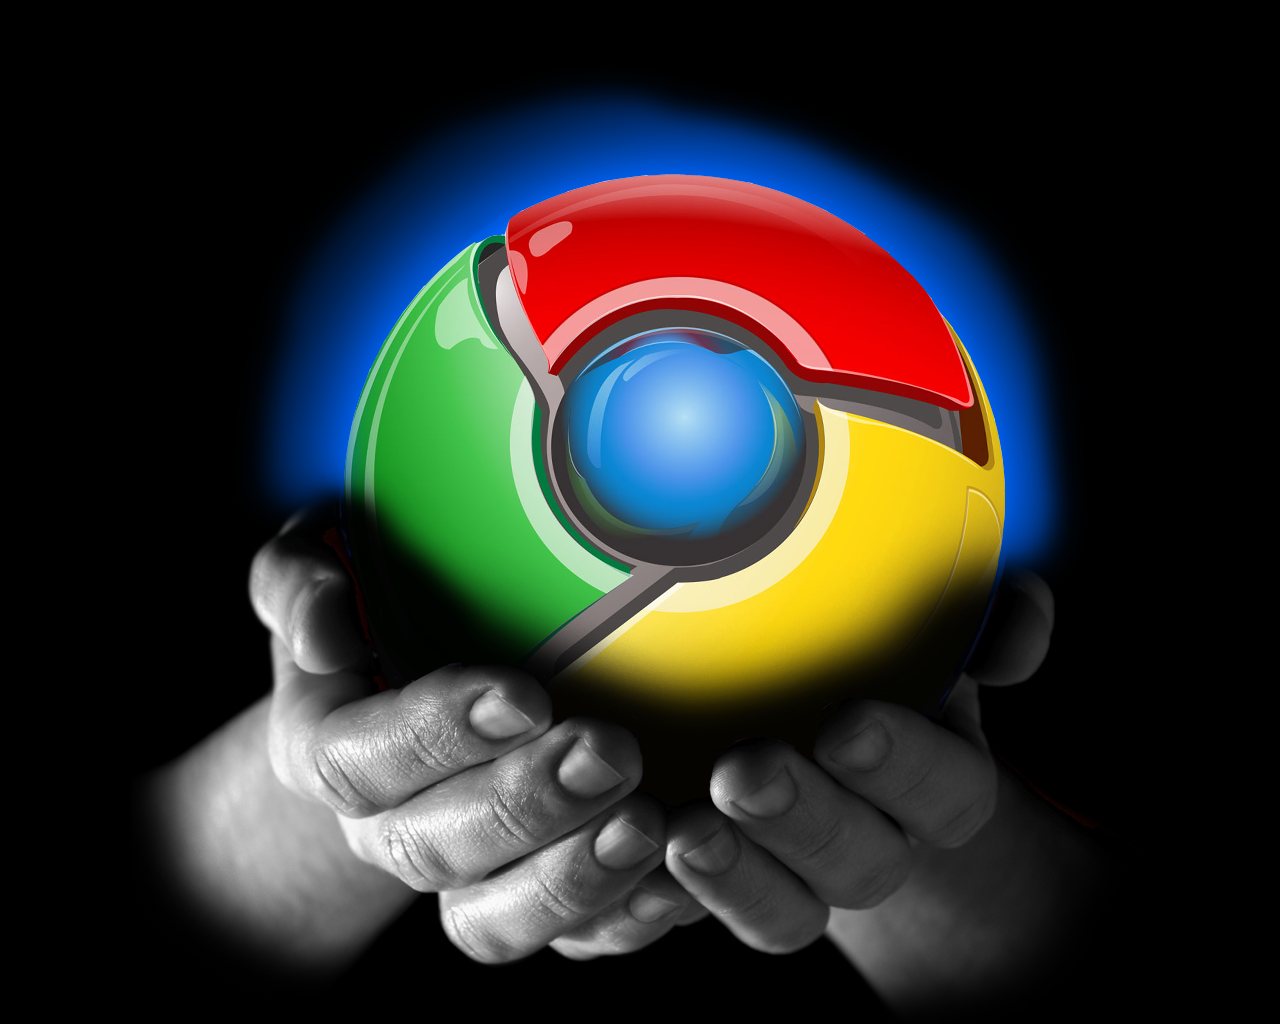 Google Chrome Wallpapers 1280x1024